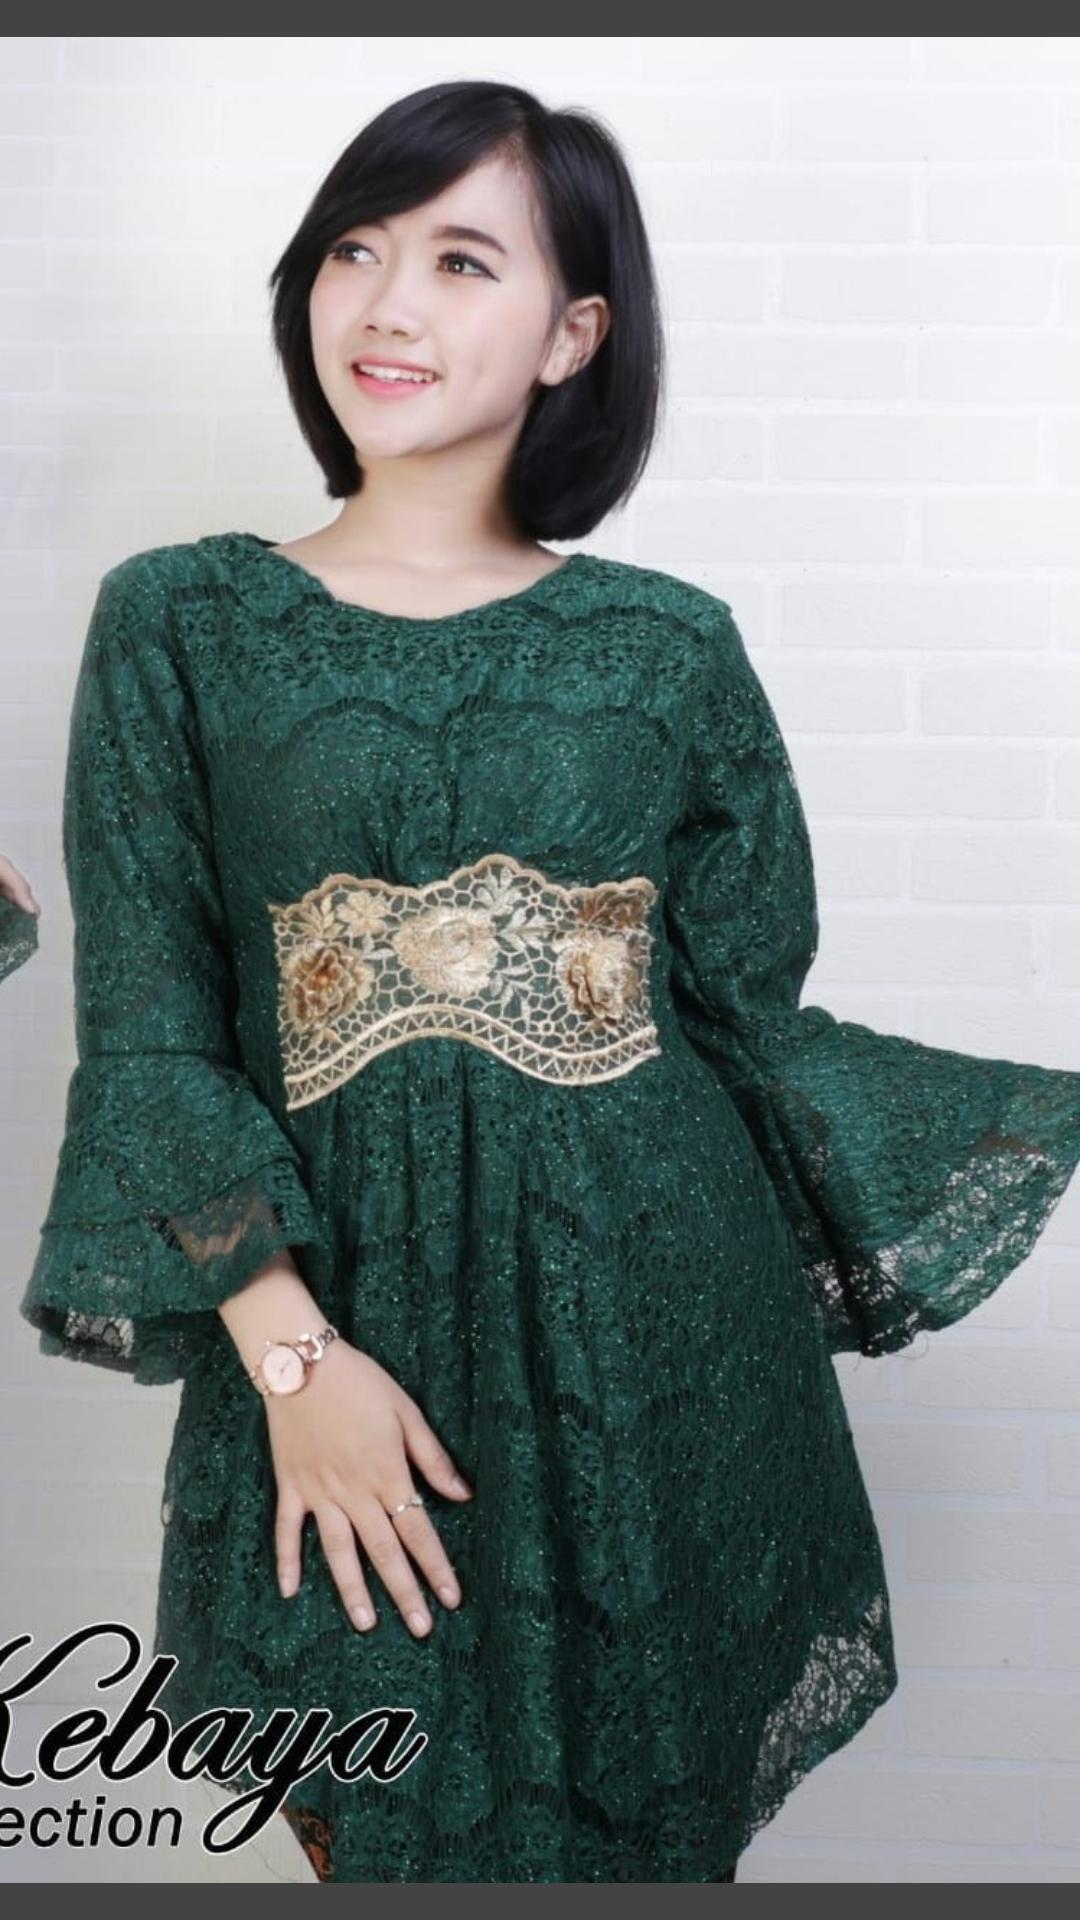 atasan kebaya brukat  pakaian batik  kebaya wanita  baju kebaya modern kebaya  brukat ad9146b4b0